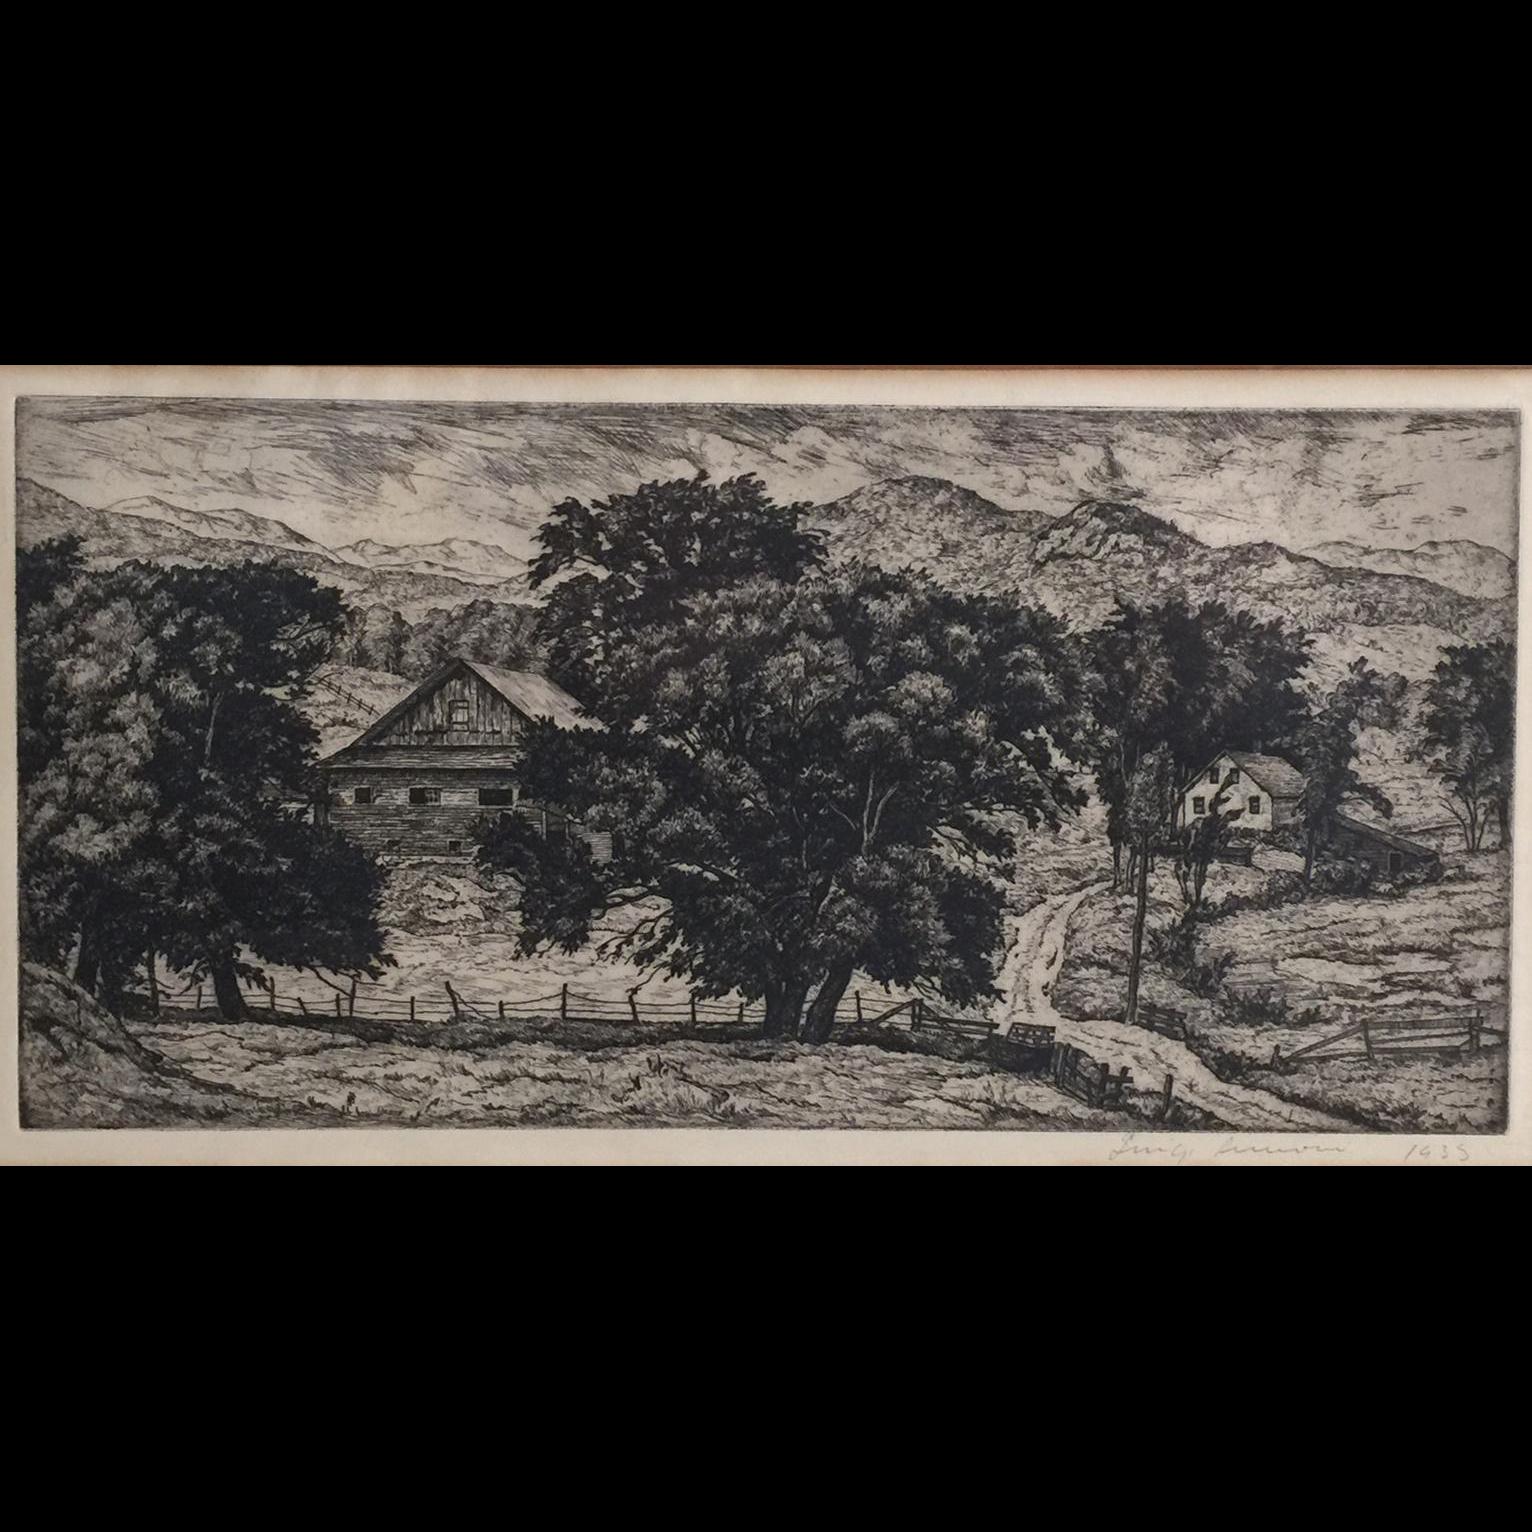 Luigi Lucioni Vermont Landscape Etching with Barn 1935